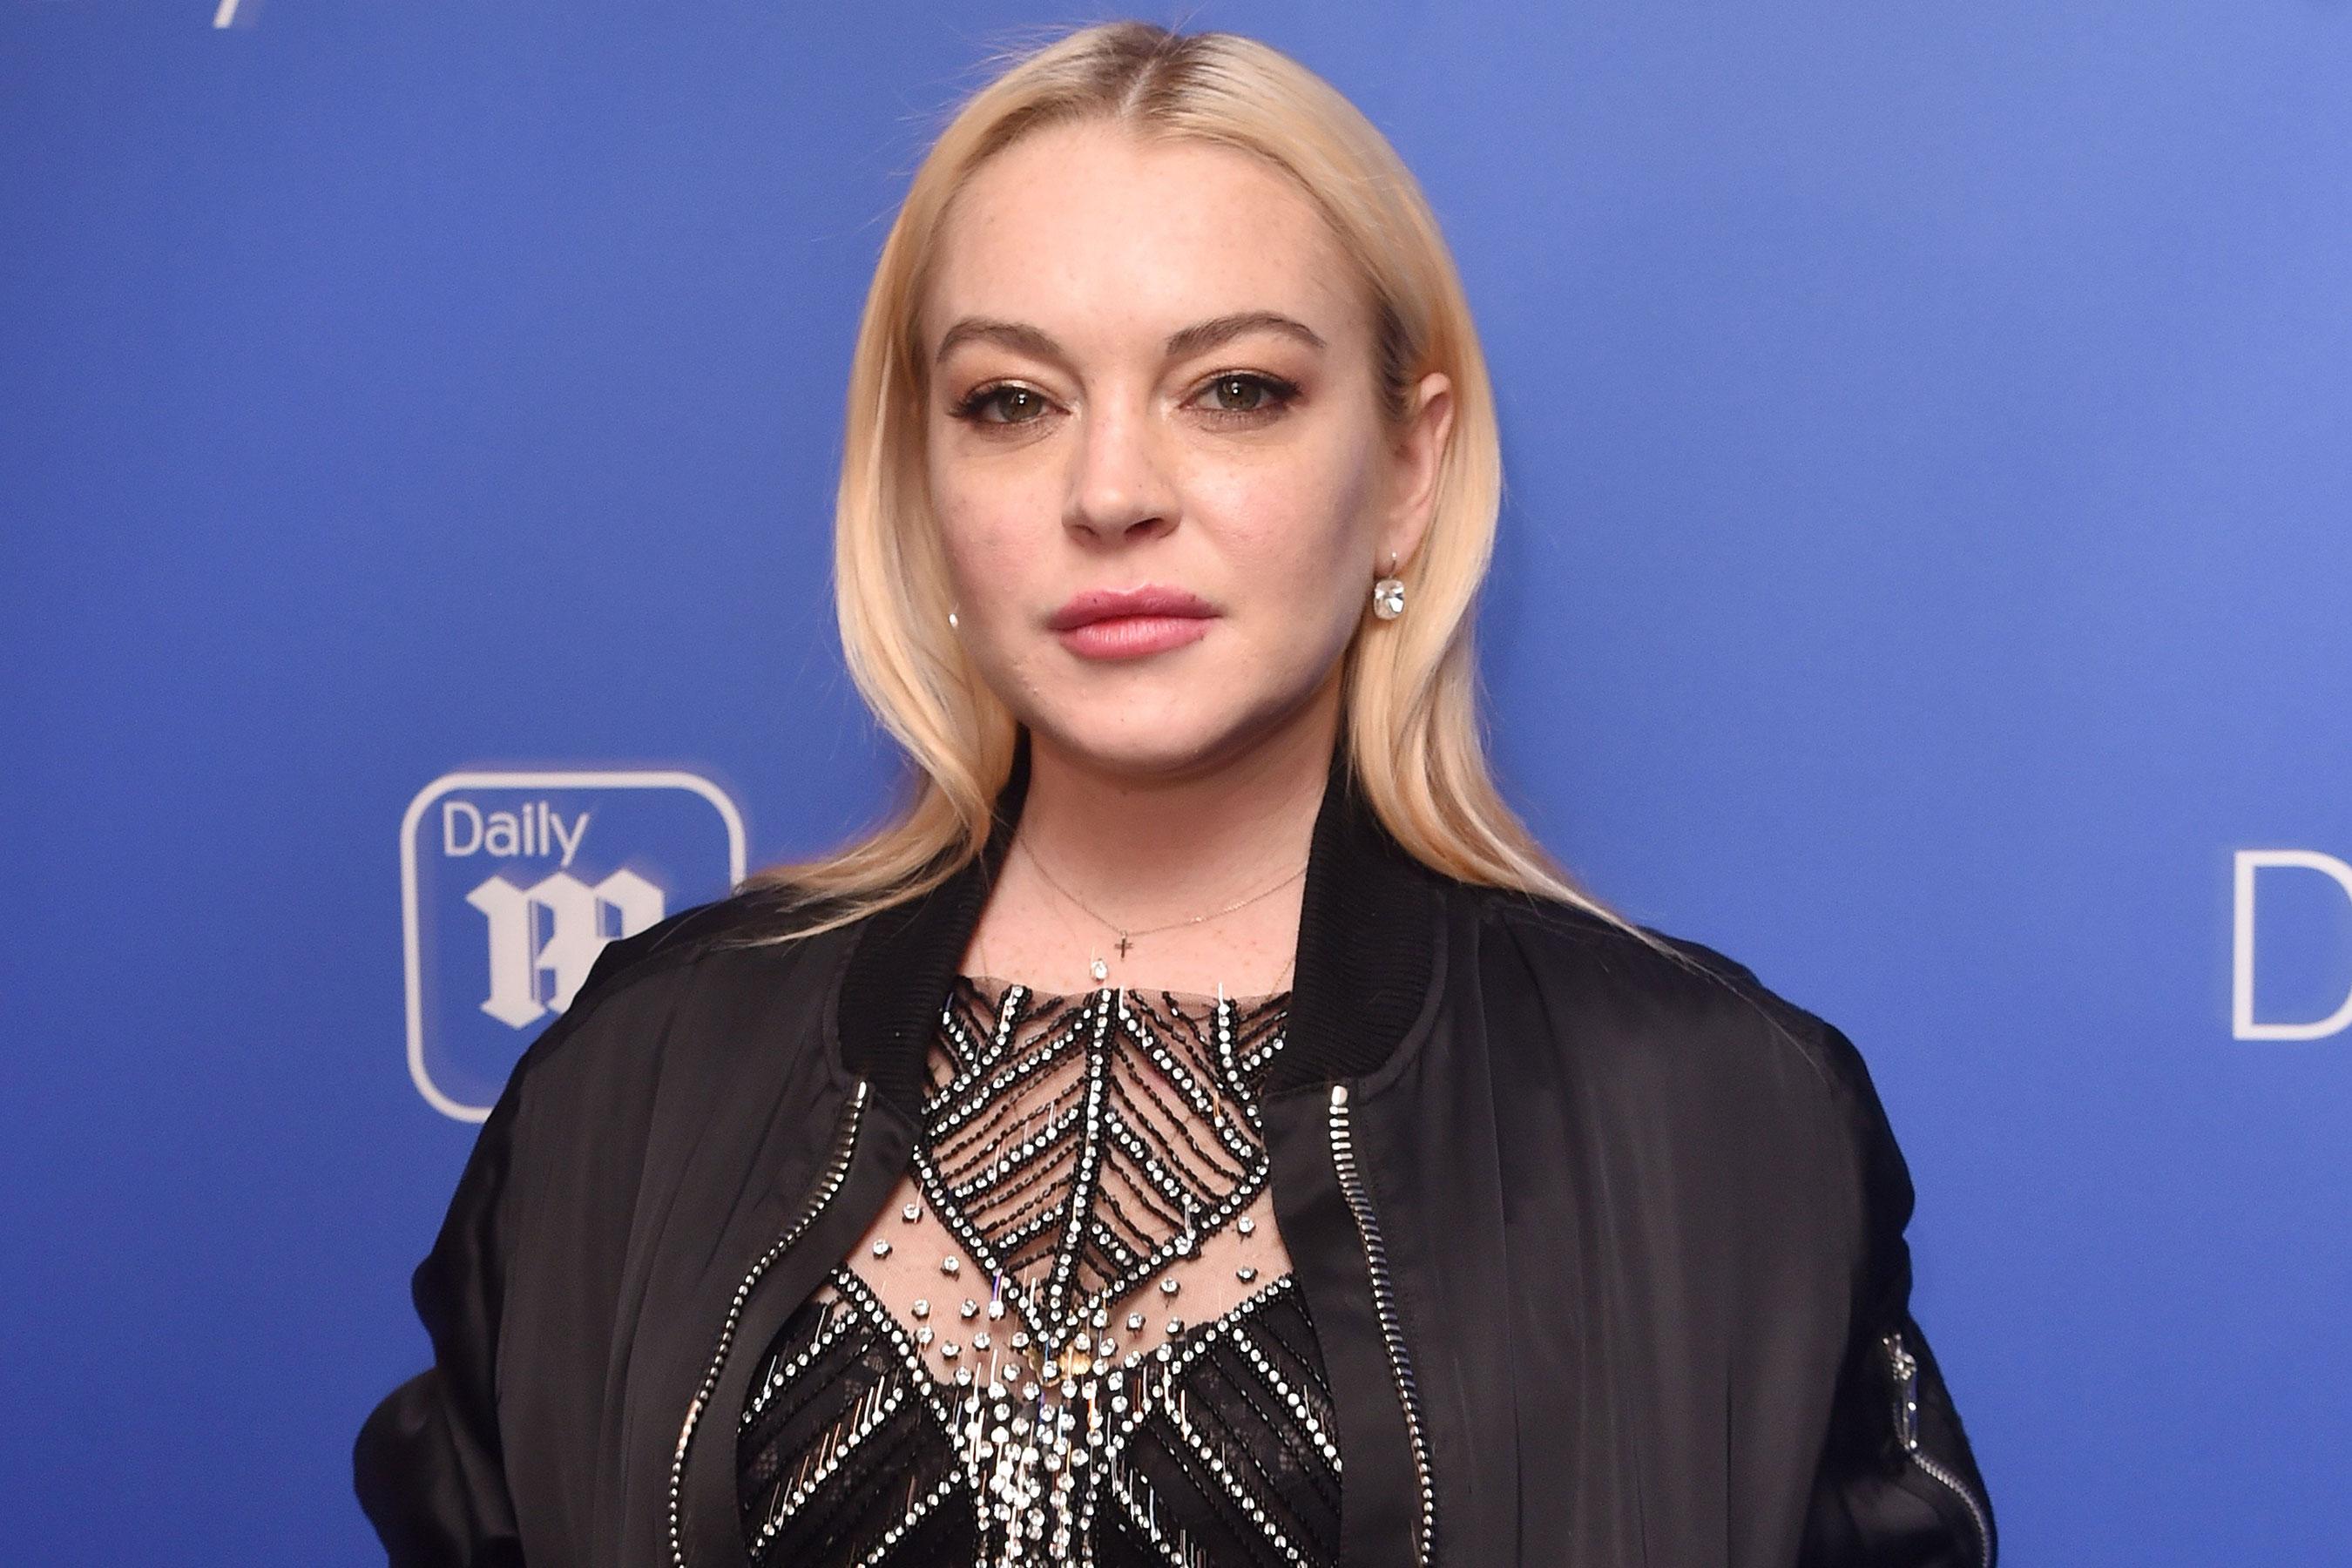 "Lindsay Lohan ""width ="" 2700 ""height ="" 1800 ""srcset ="" https://www.top5.com/wp-content/uploads/2013/01/lindsay-lohan-bizzare-celebrity-arrests -27.jpg 2700w, https://www.top5.com/wp-content/uploads/2013/01/lindsay-lohan-bizzare-celebrity-arrests--300x200.jpg 300w, https://www.top5.com / wp-content / uploads / 2013/01 / lindsay-lohan-bizzare-celebrity-arrests - 768x512.jpg 768w, https://www.top5.com/wp-content/uploads/2013/01/lindsay-lohan- bizzare-celebrity-arrests- -1024x683.jpg 1024w ""Sizes ="" (maximum width: 2700px) 100VW, 2700px"